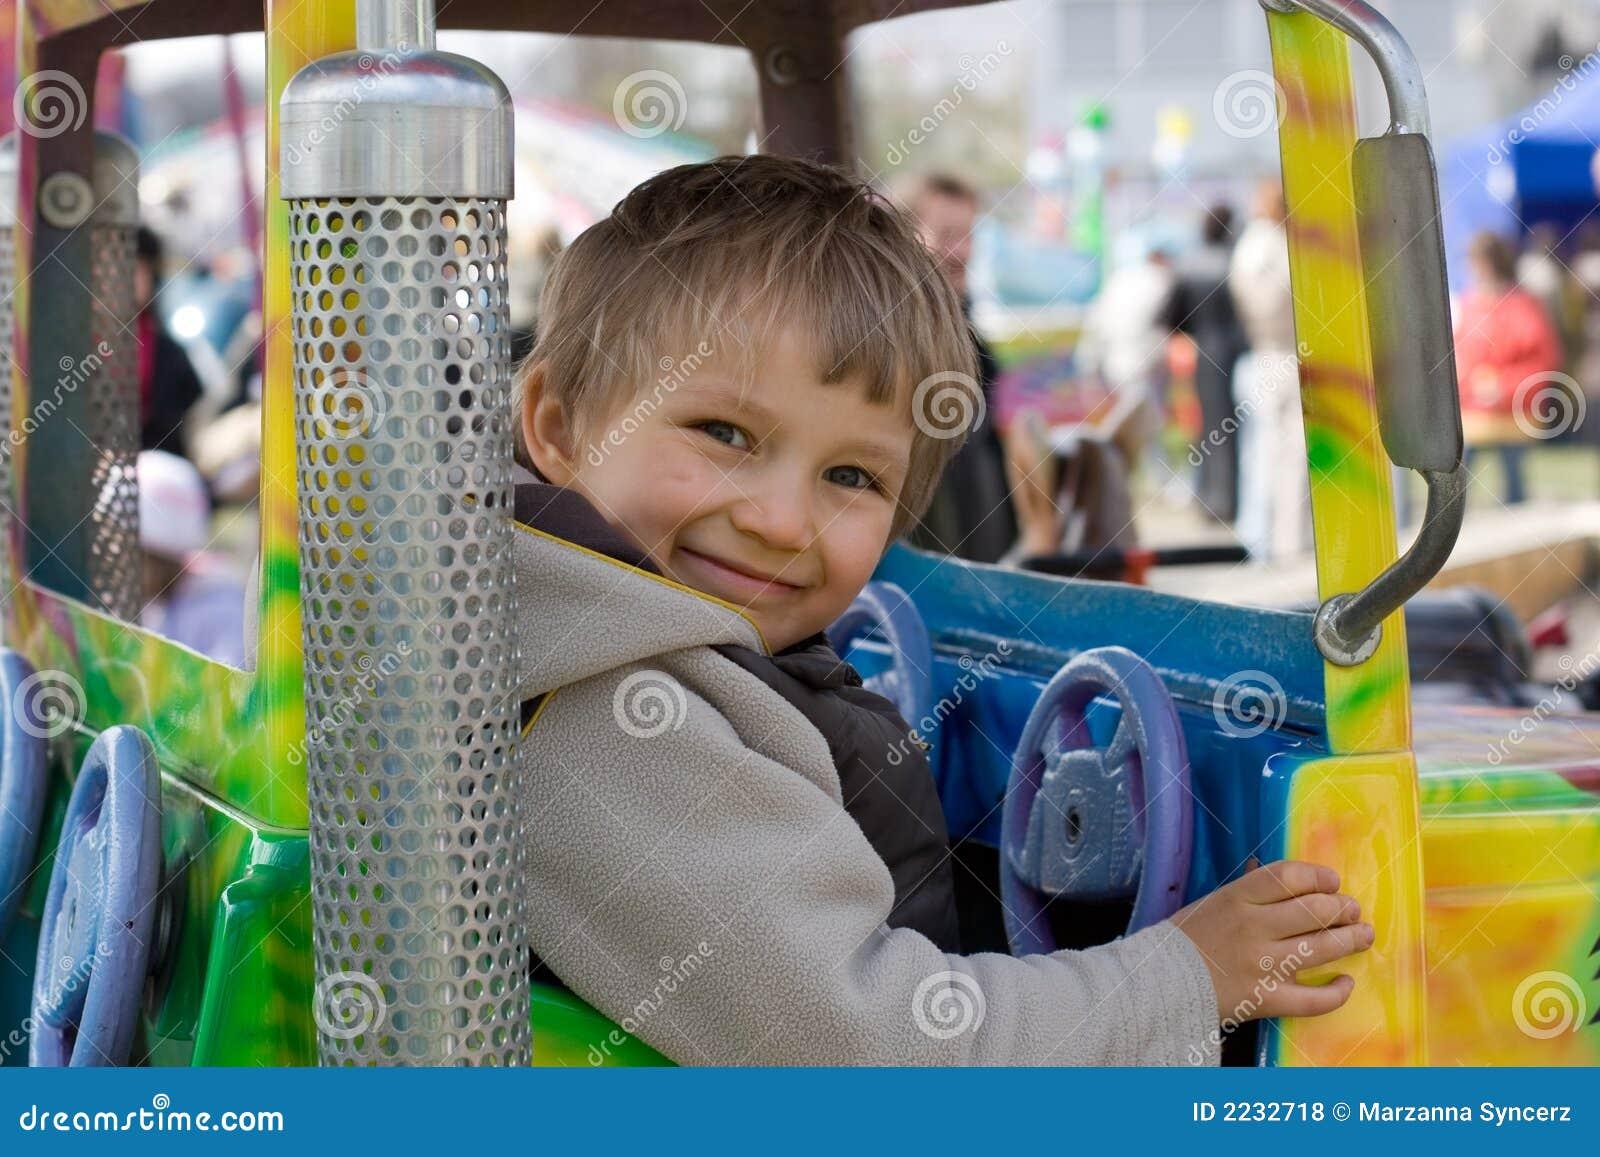 Small Boy on Amusement Ride